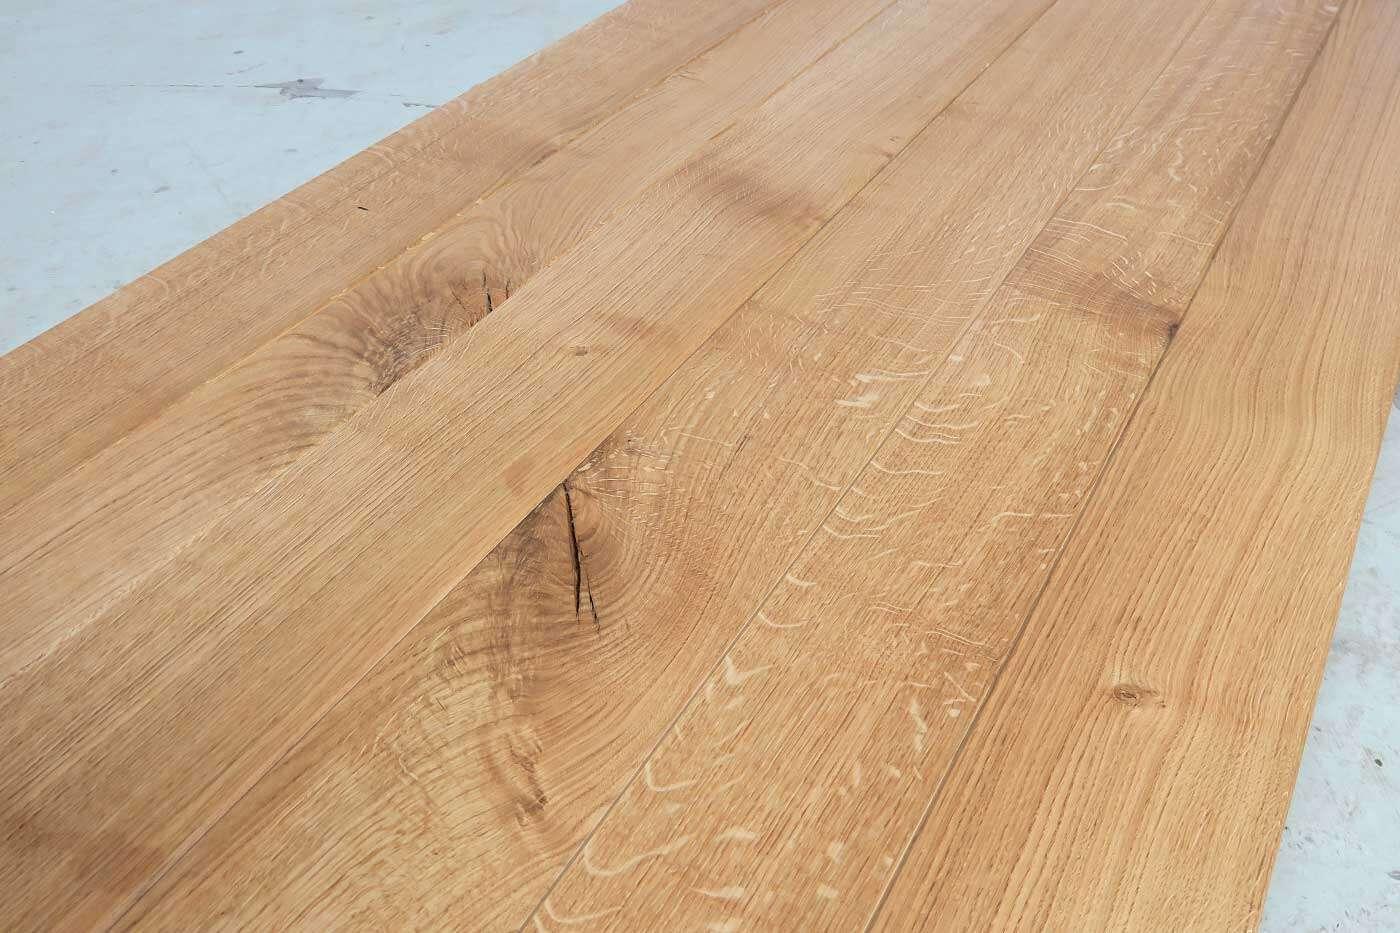 massivholz eiche tischplatte gezackt 245x90cm. Black Bedroom Furniture Sets. Home Design Ideas